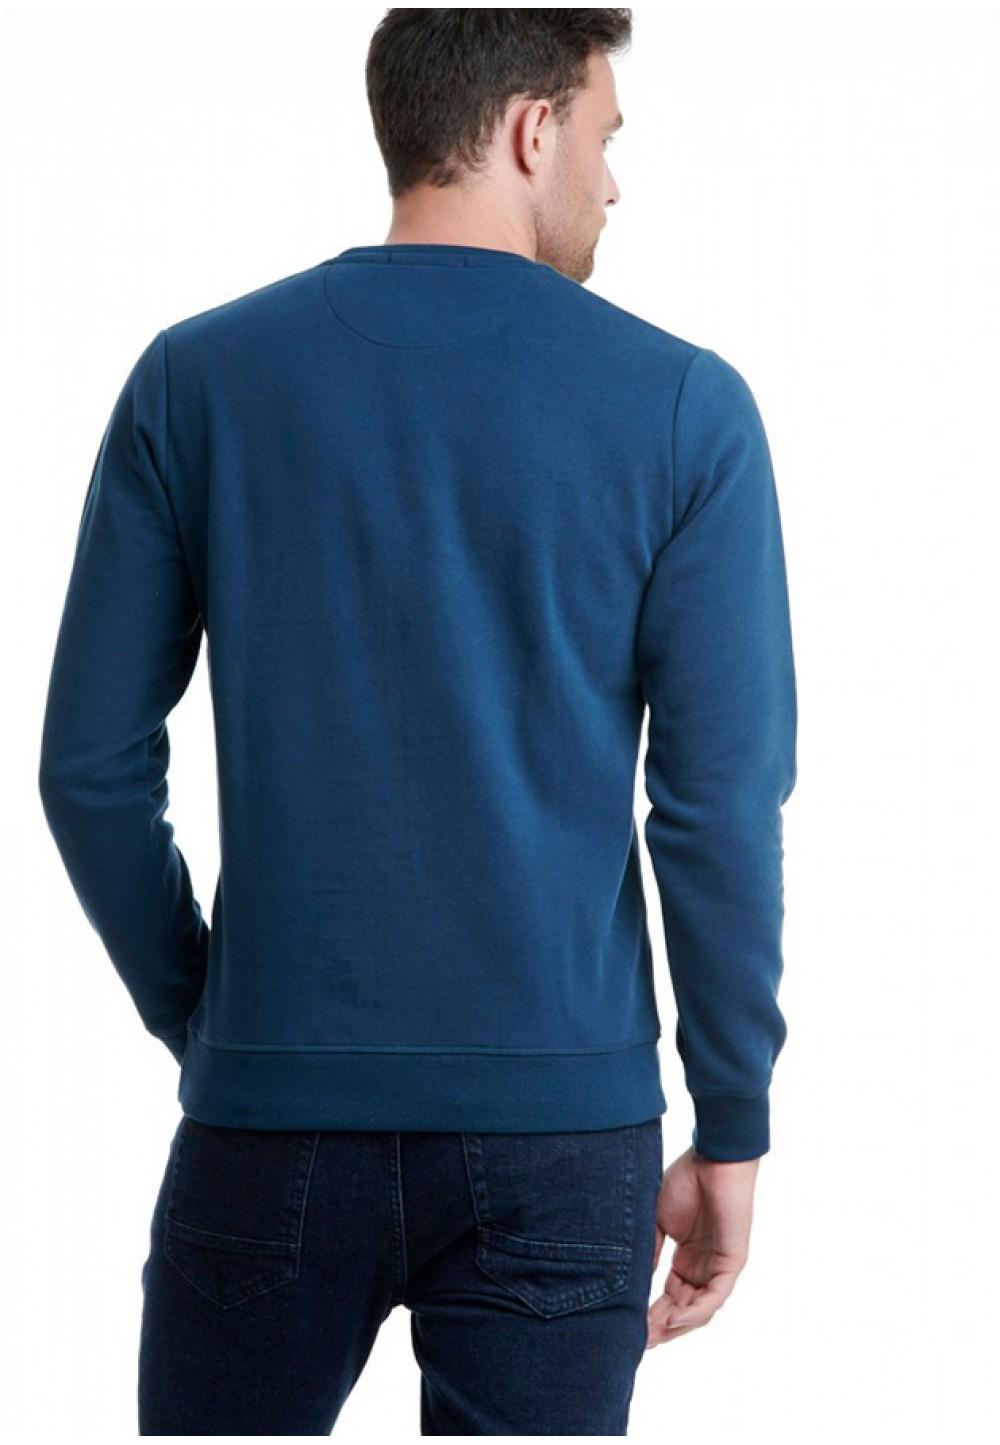 Синий мужской свитшот с логотипом